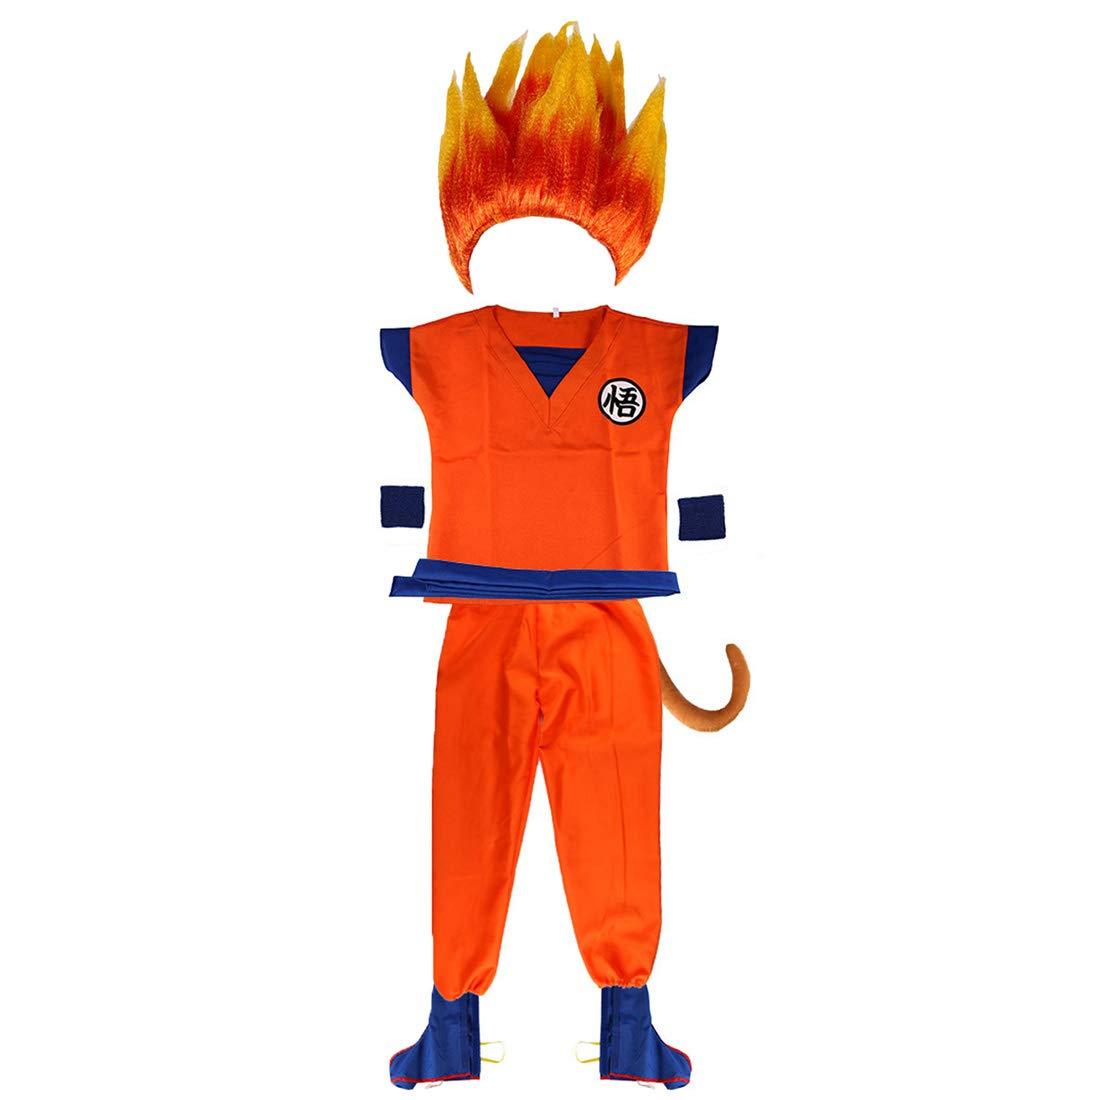 Halloween Disfraces de Disfraces de Disfraces Cosplay ...